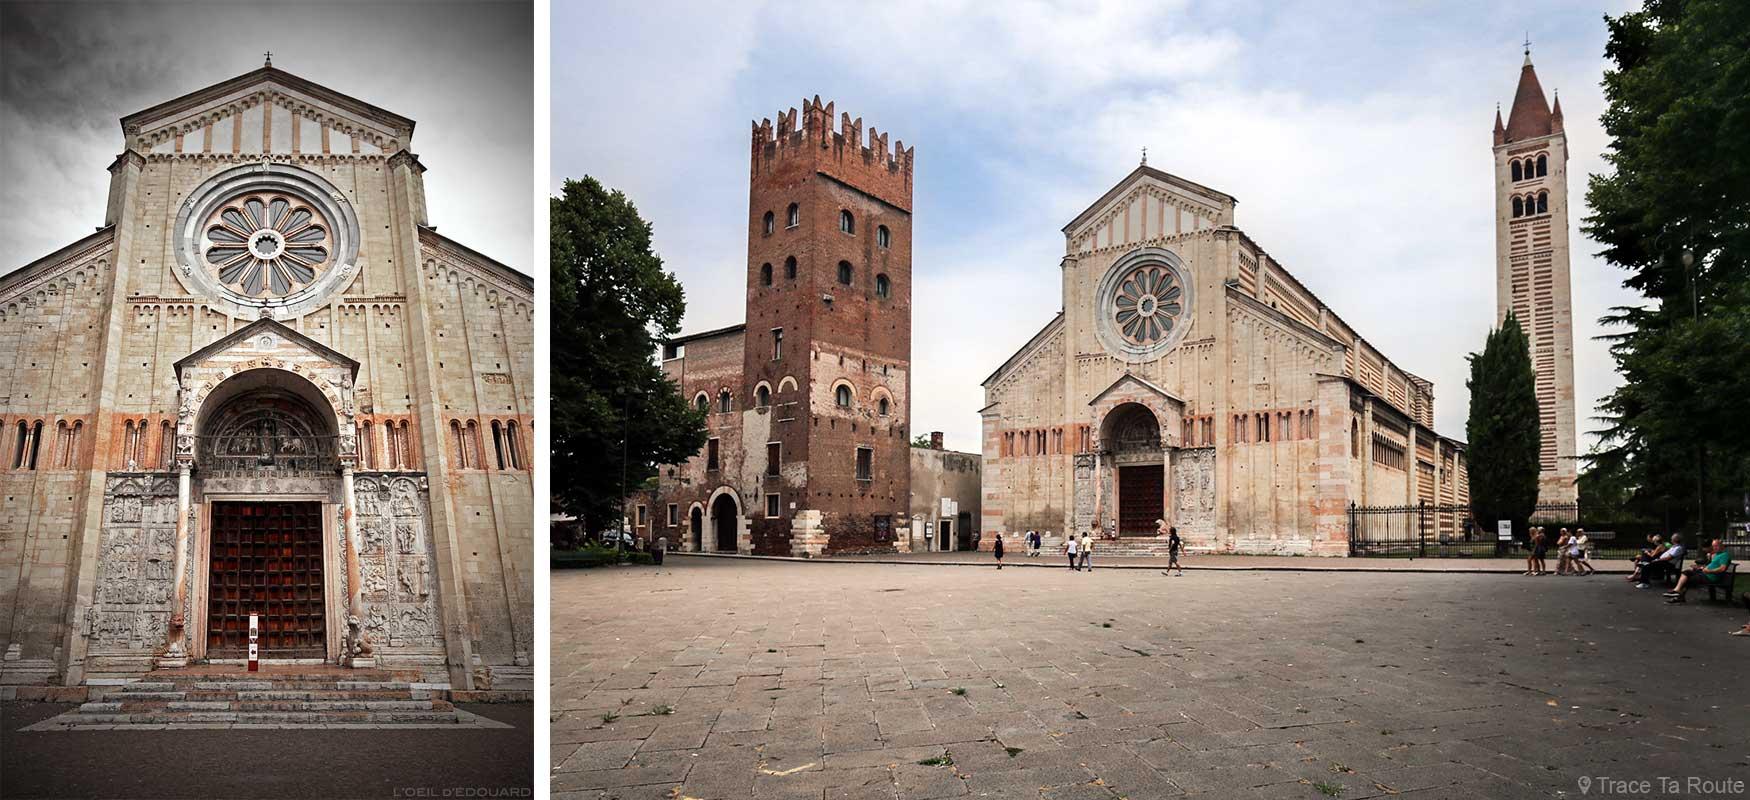 Porte et rosace de la Basilique San Zeno de Vérone - architecture extérieure Basilica San Zeno Maggiore di Verona